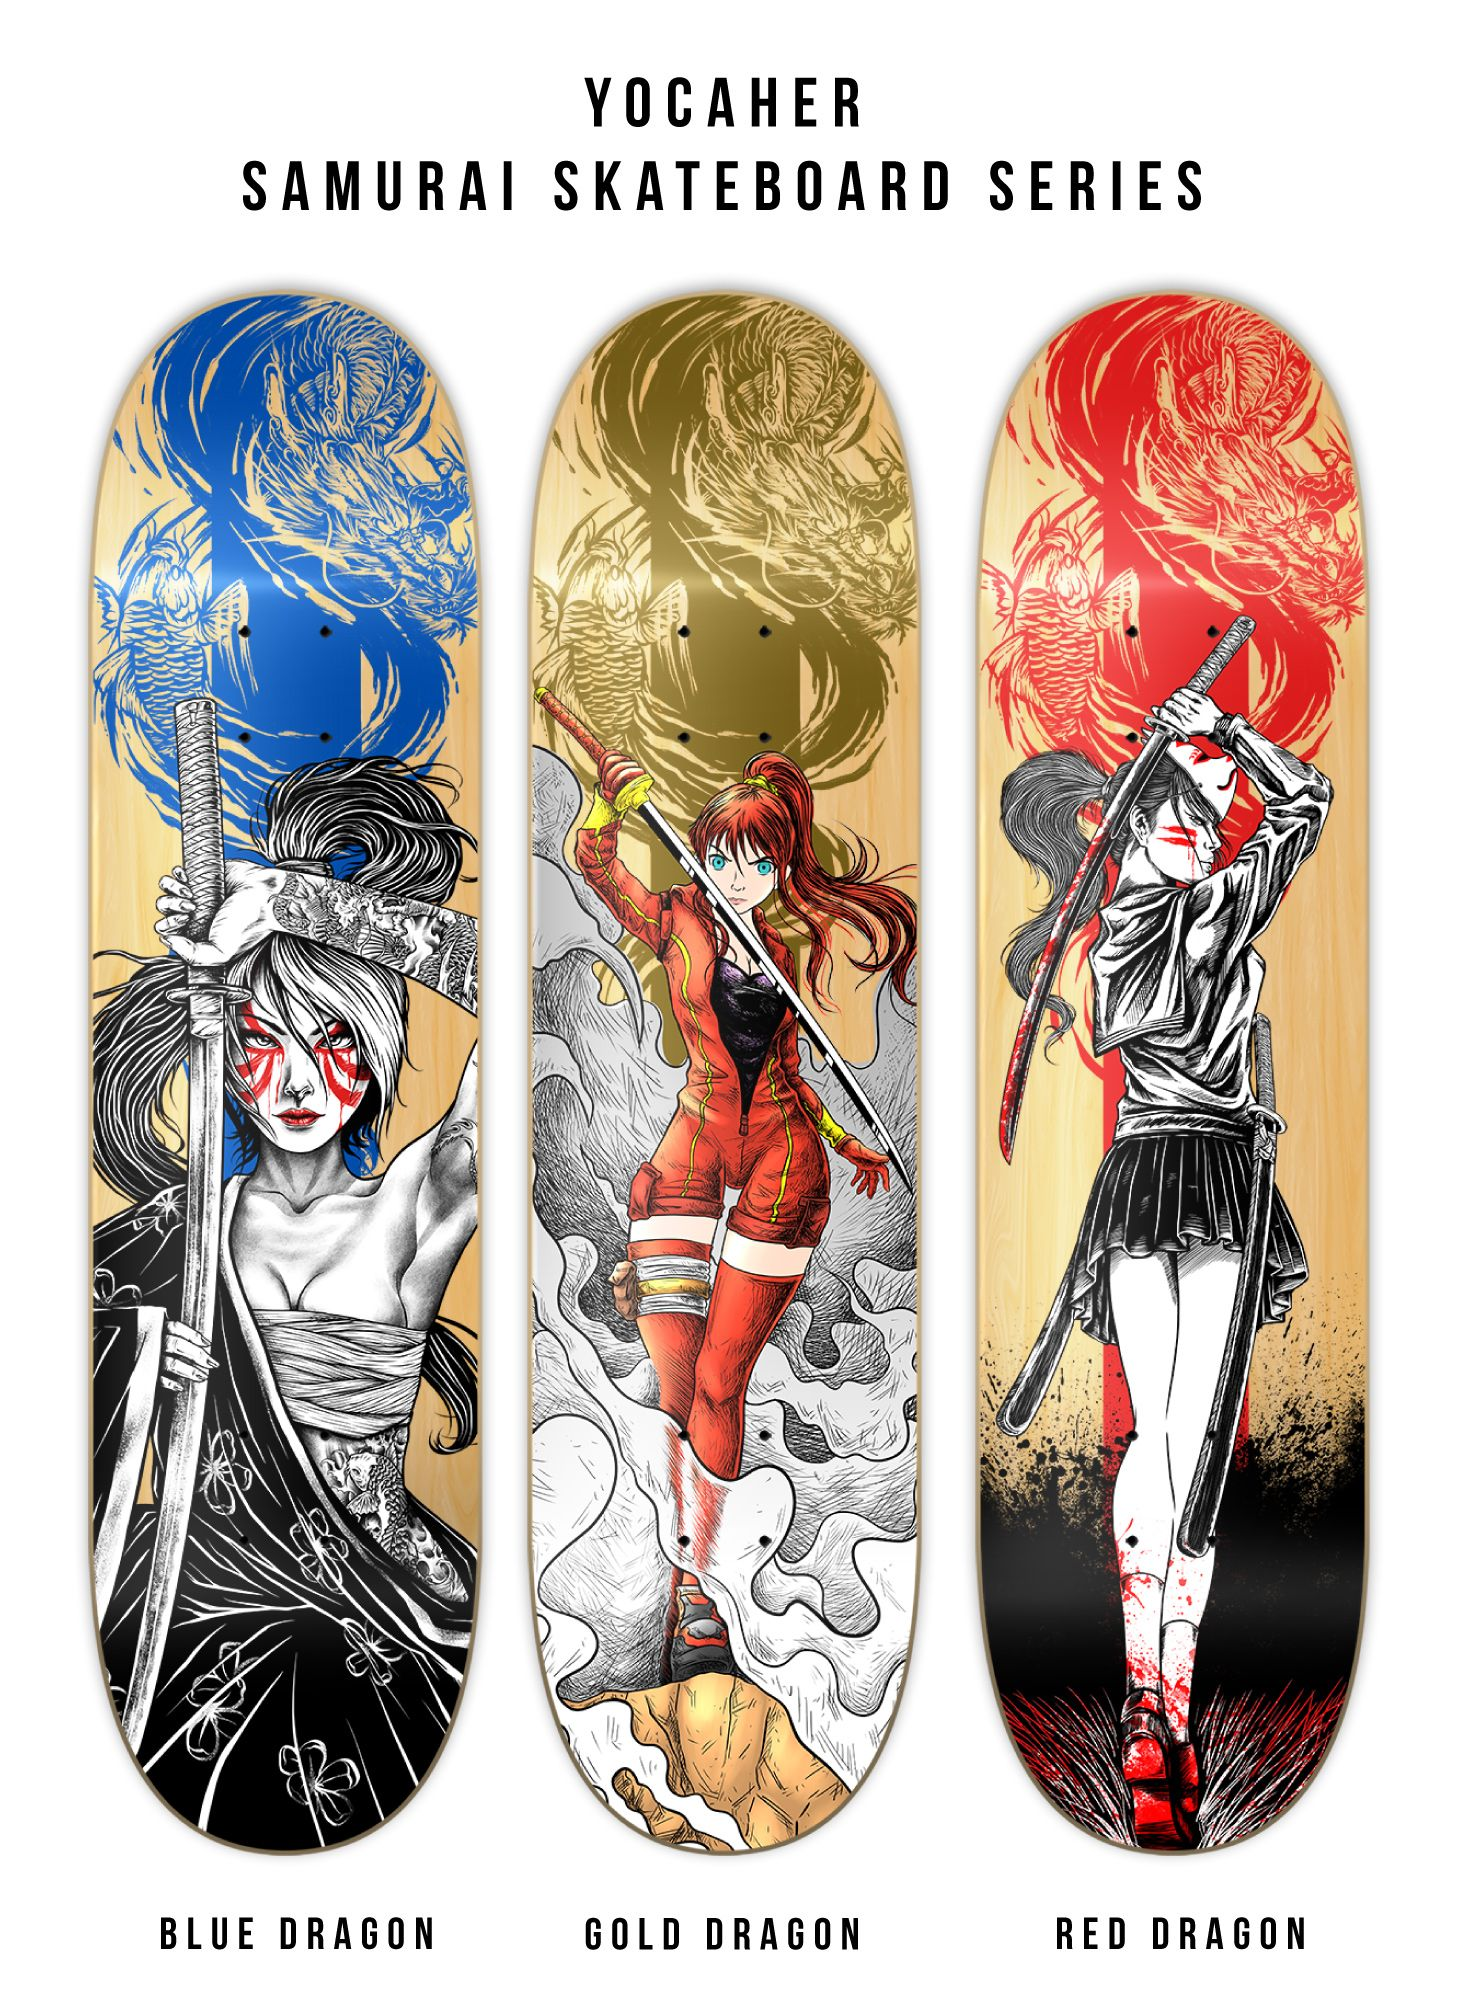 "Girl Samurai Red Dragon Yocaher 7.75/"" Graphic Complete Skateboard"